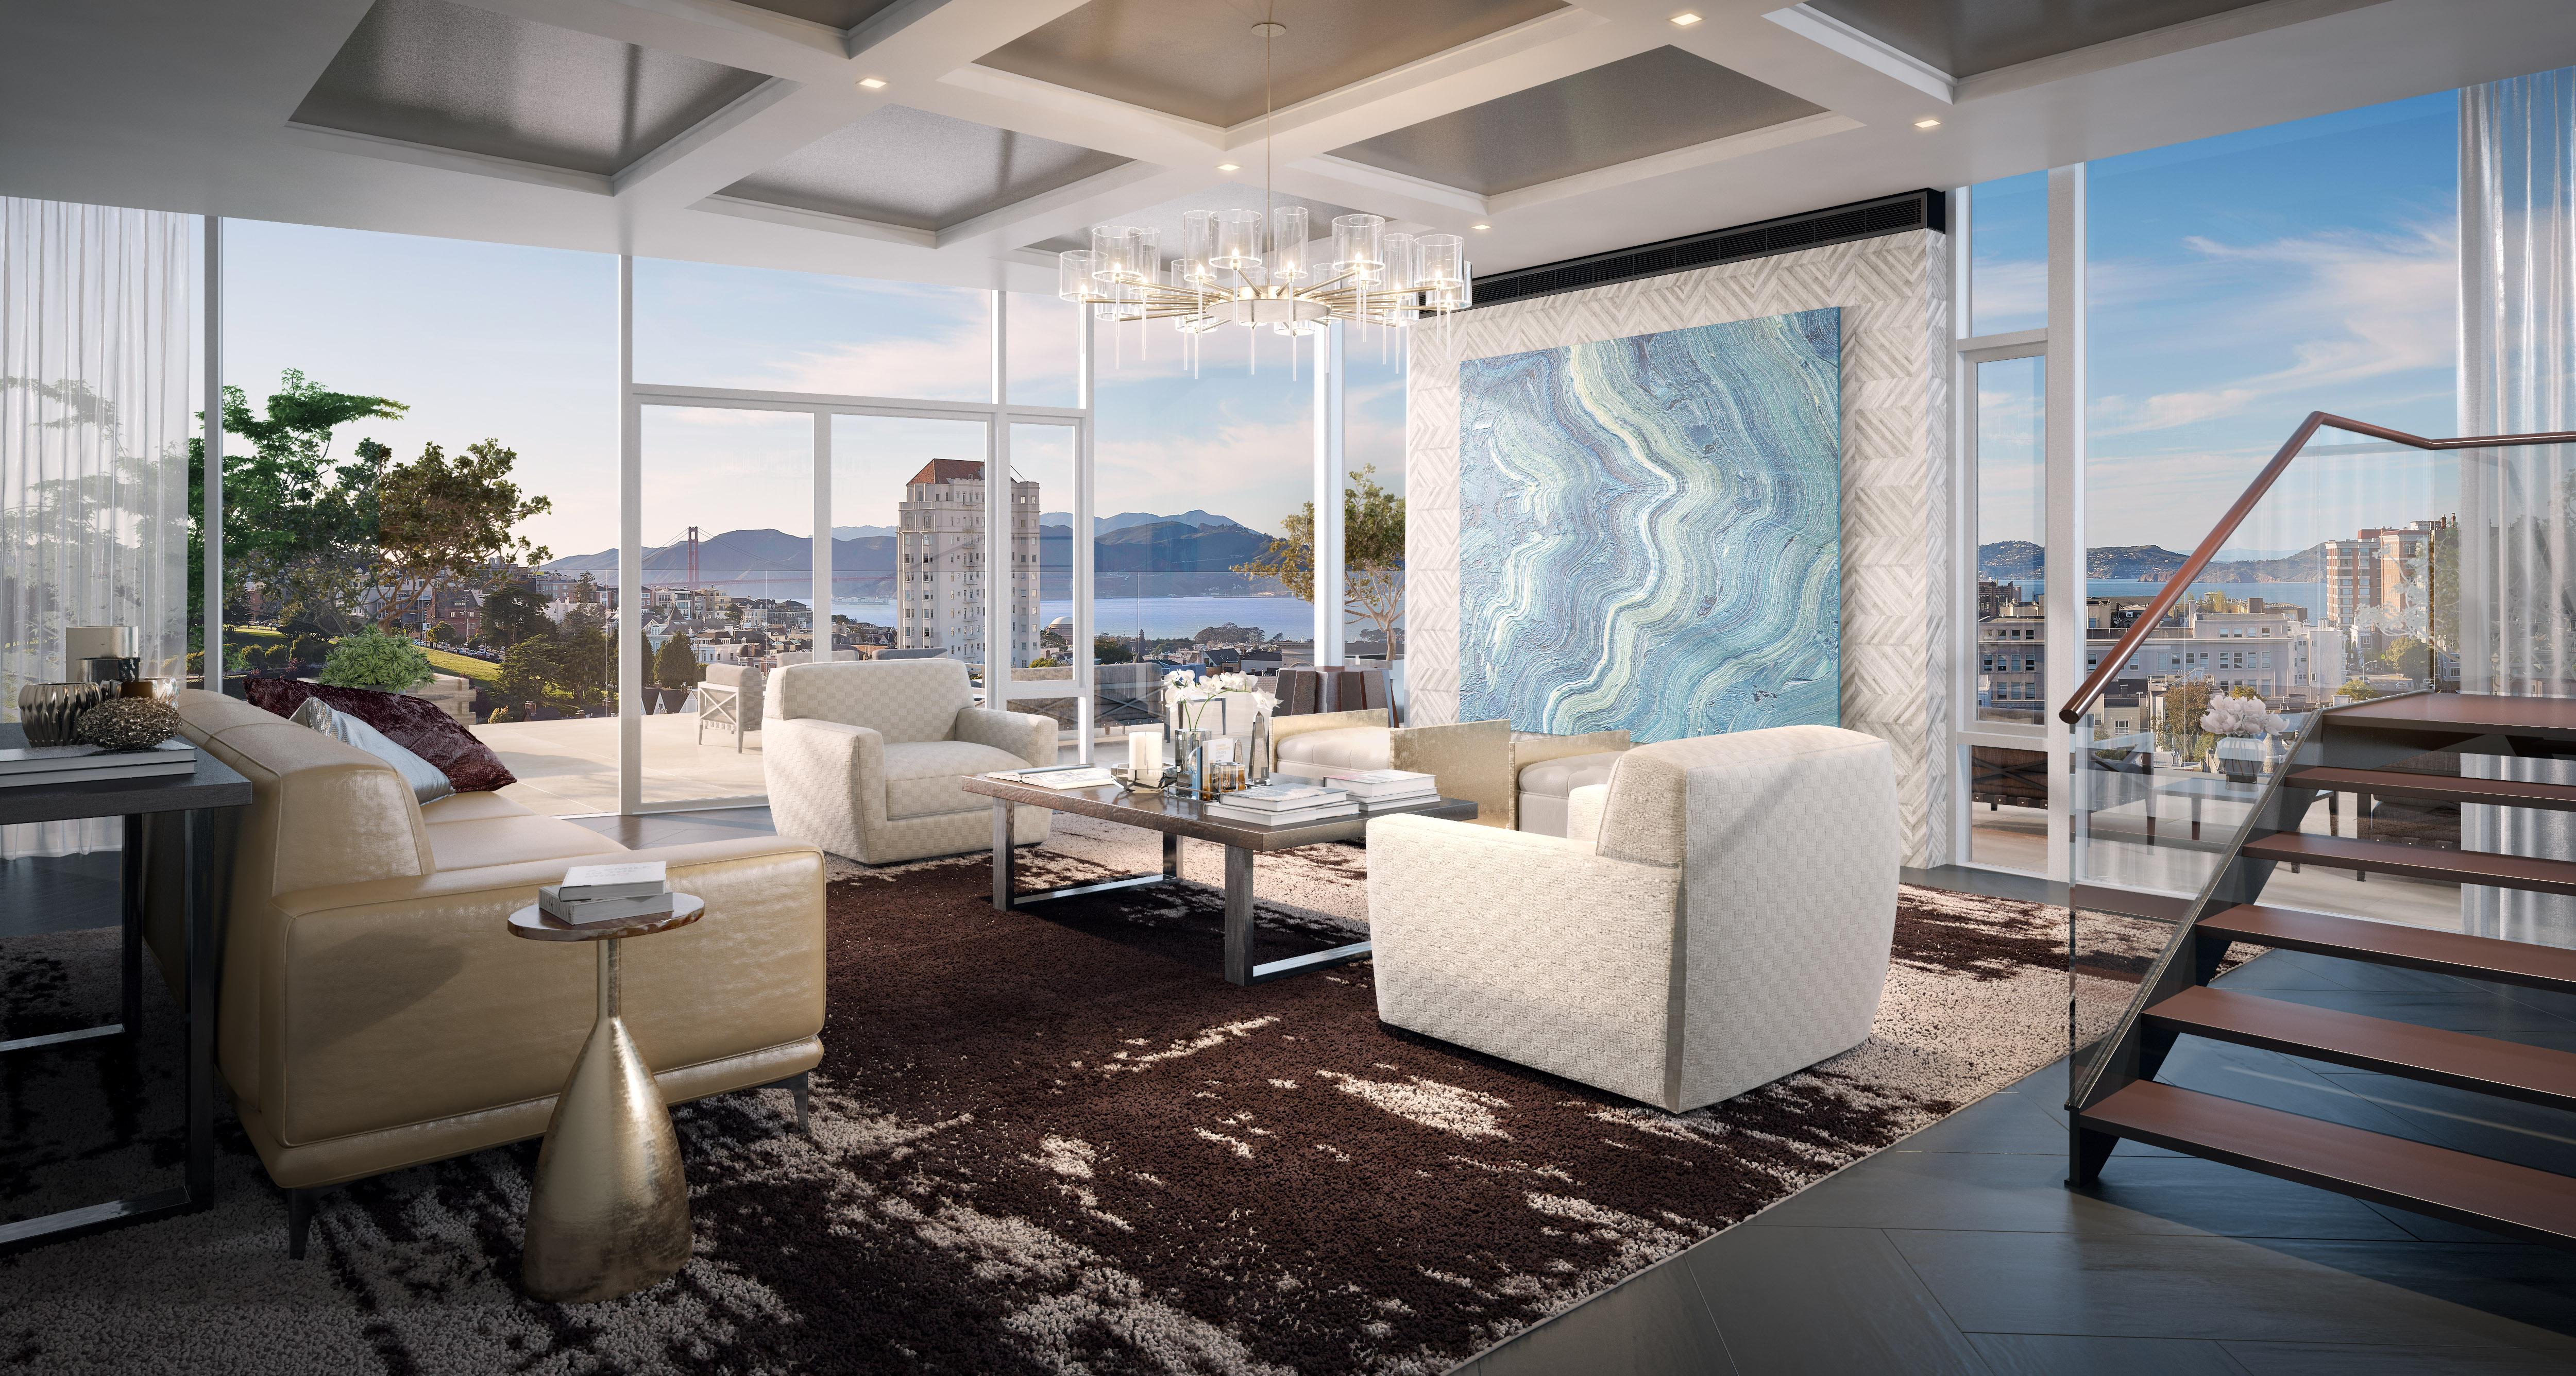 San francisco penthouse sells for 32 million update - Interior decorator san francisco ...